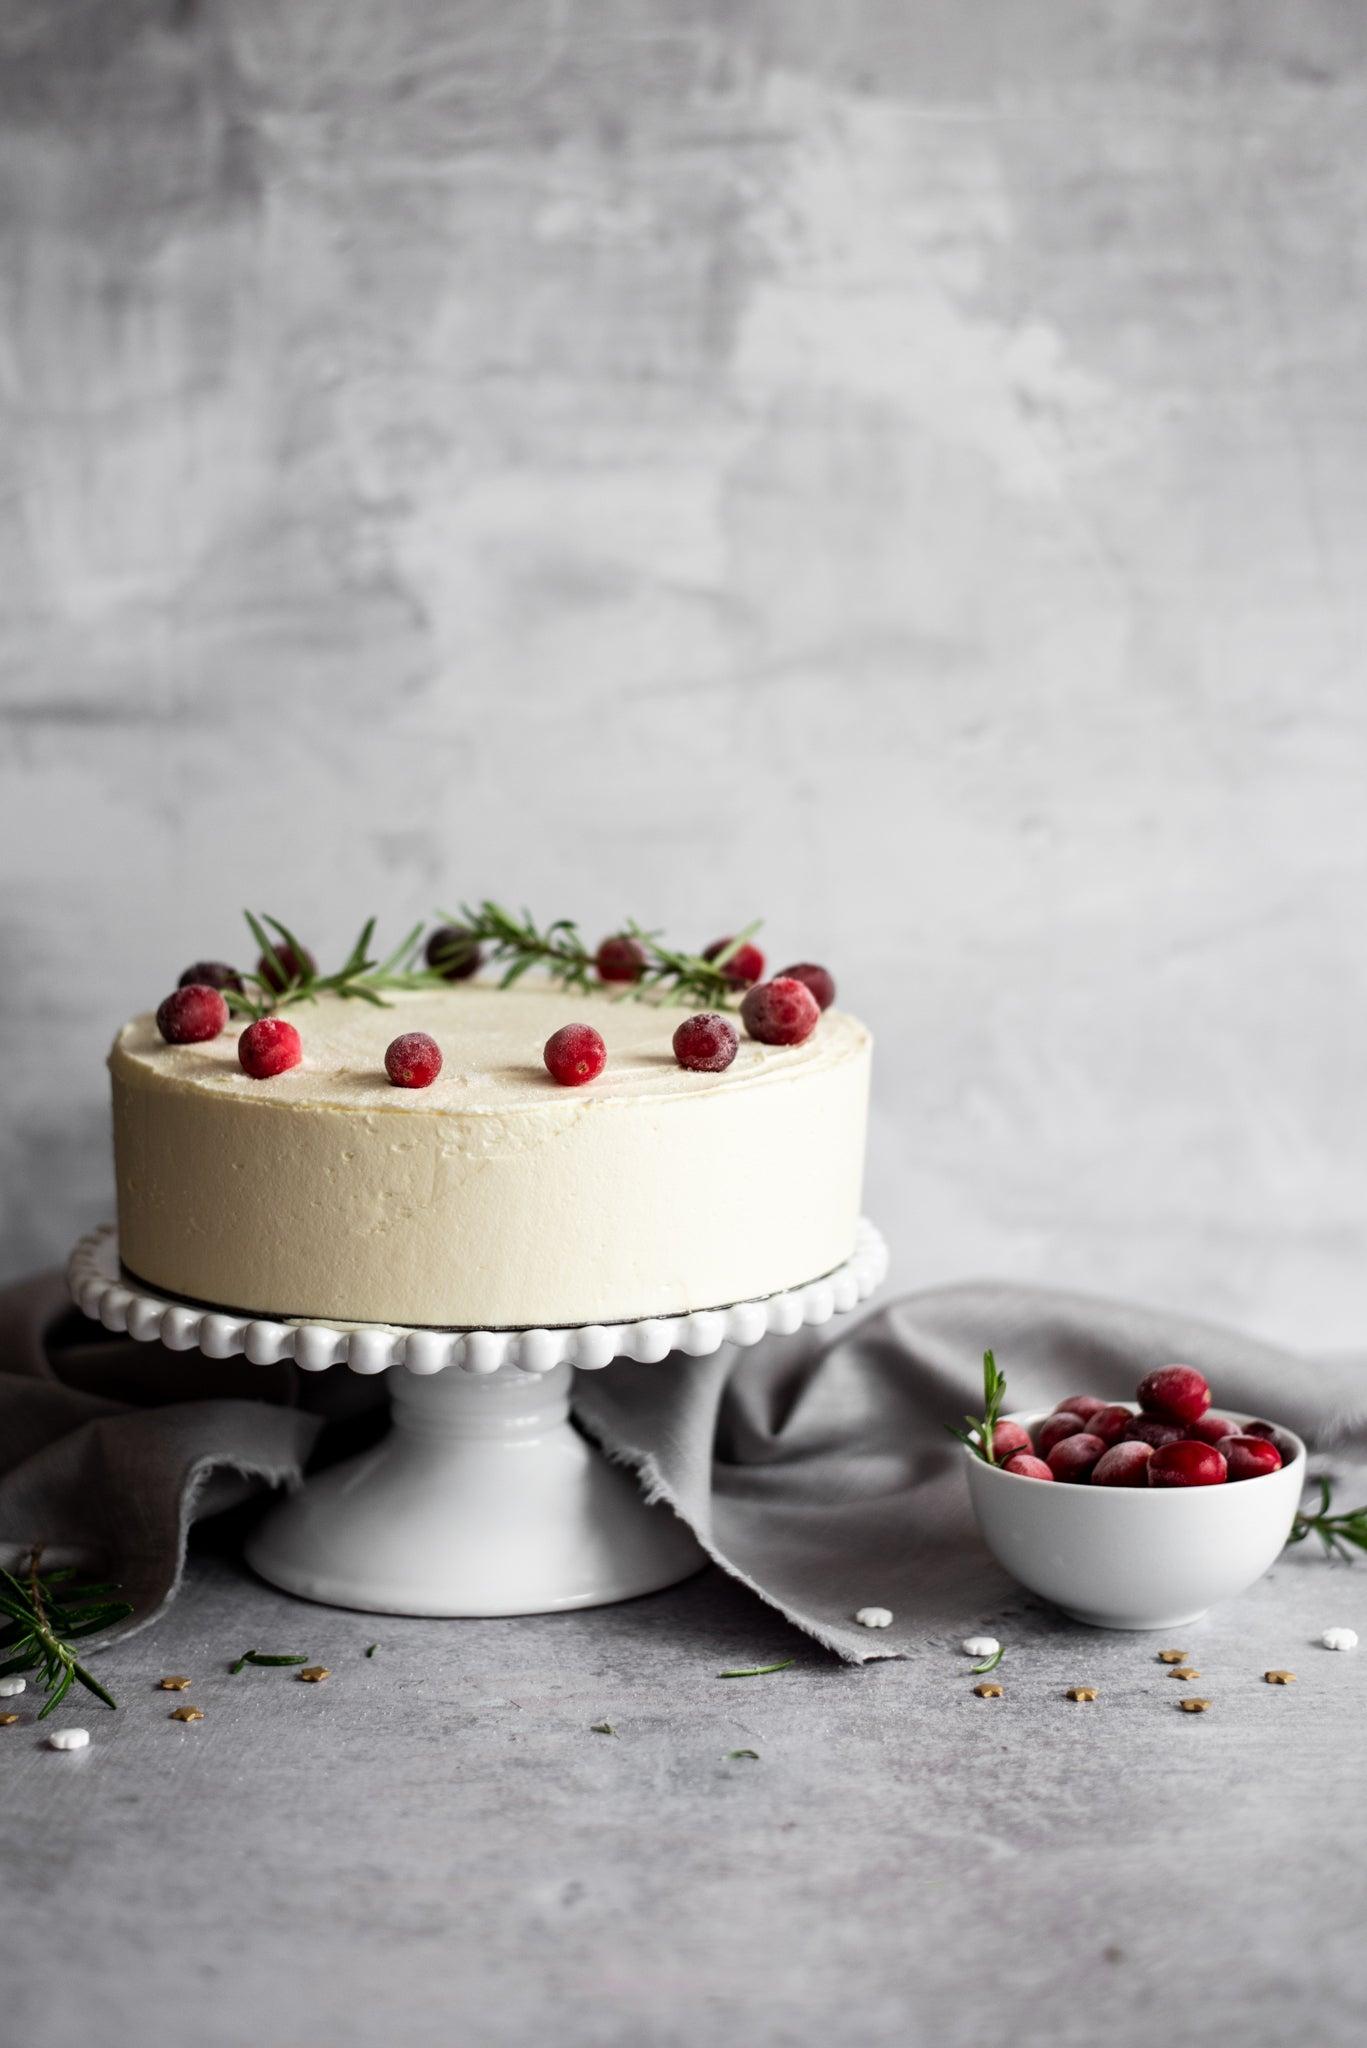 Snowy-White-Christmas-Cake-WEB-RES-5.jpg